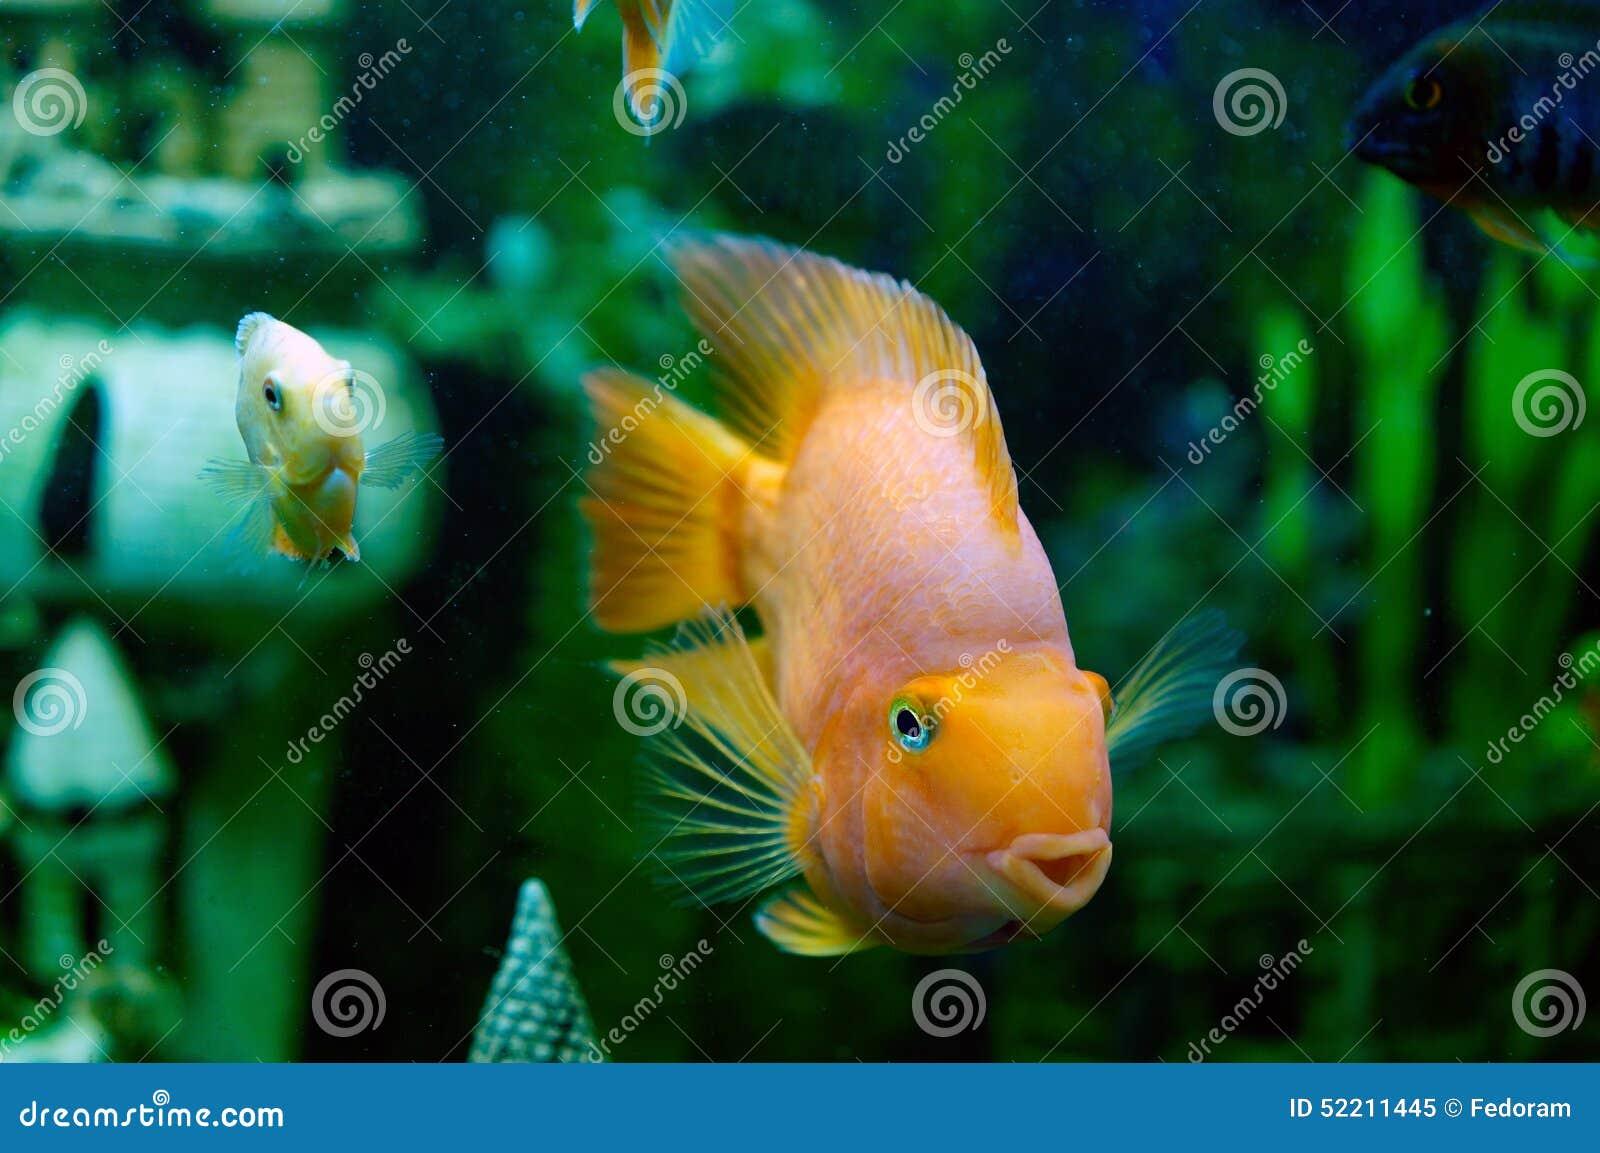 Small fish stock image. Image of goldfish, leadership - 52211445